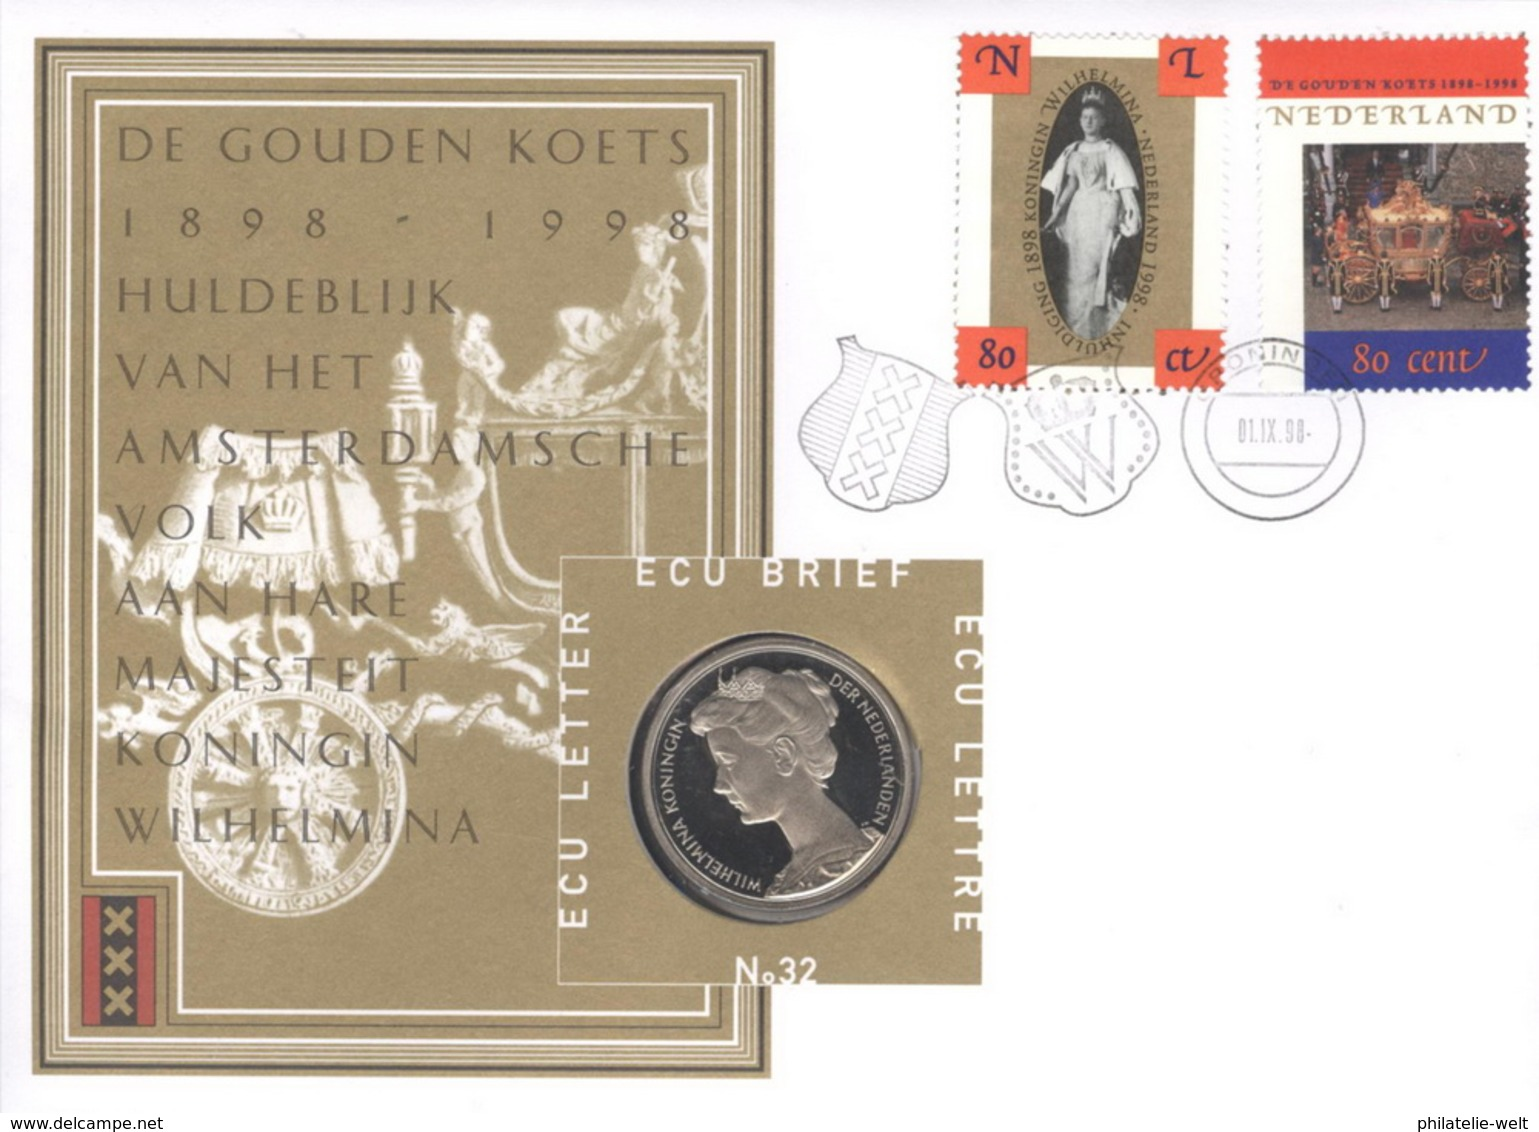 Niederlande Numisbrief ECU Nr. 32 - Niederlande